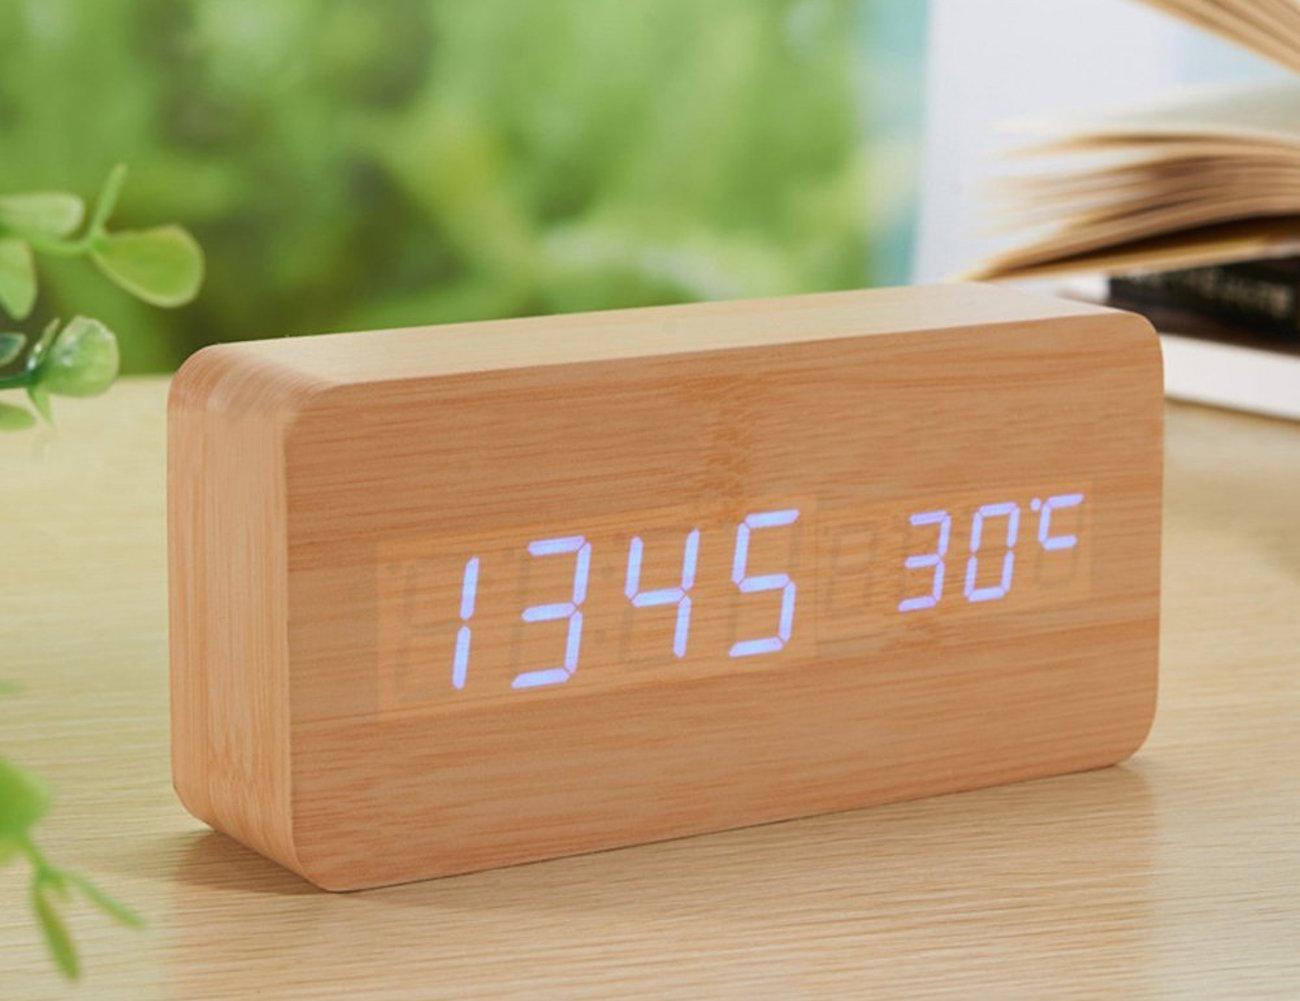 sea-team-wood-imitation-electronic-desk-clock-04